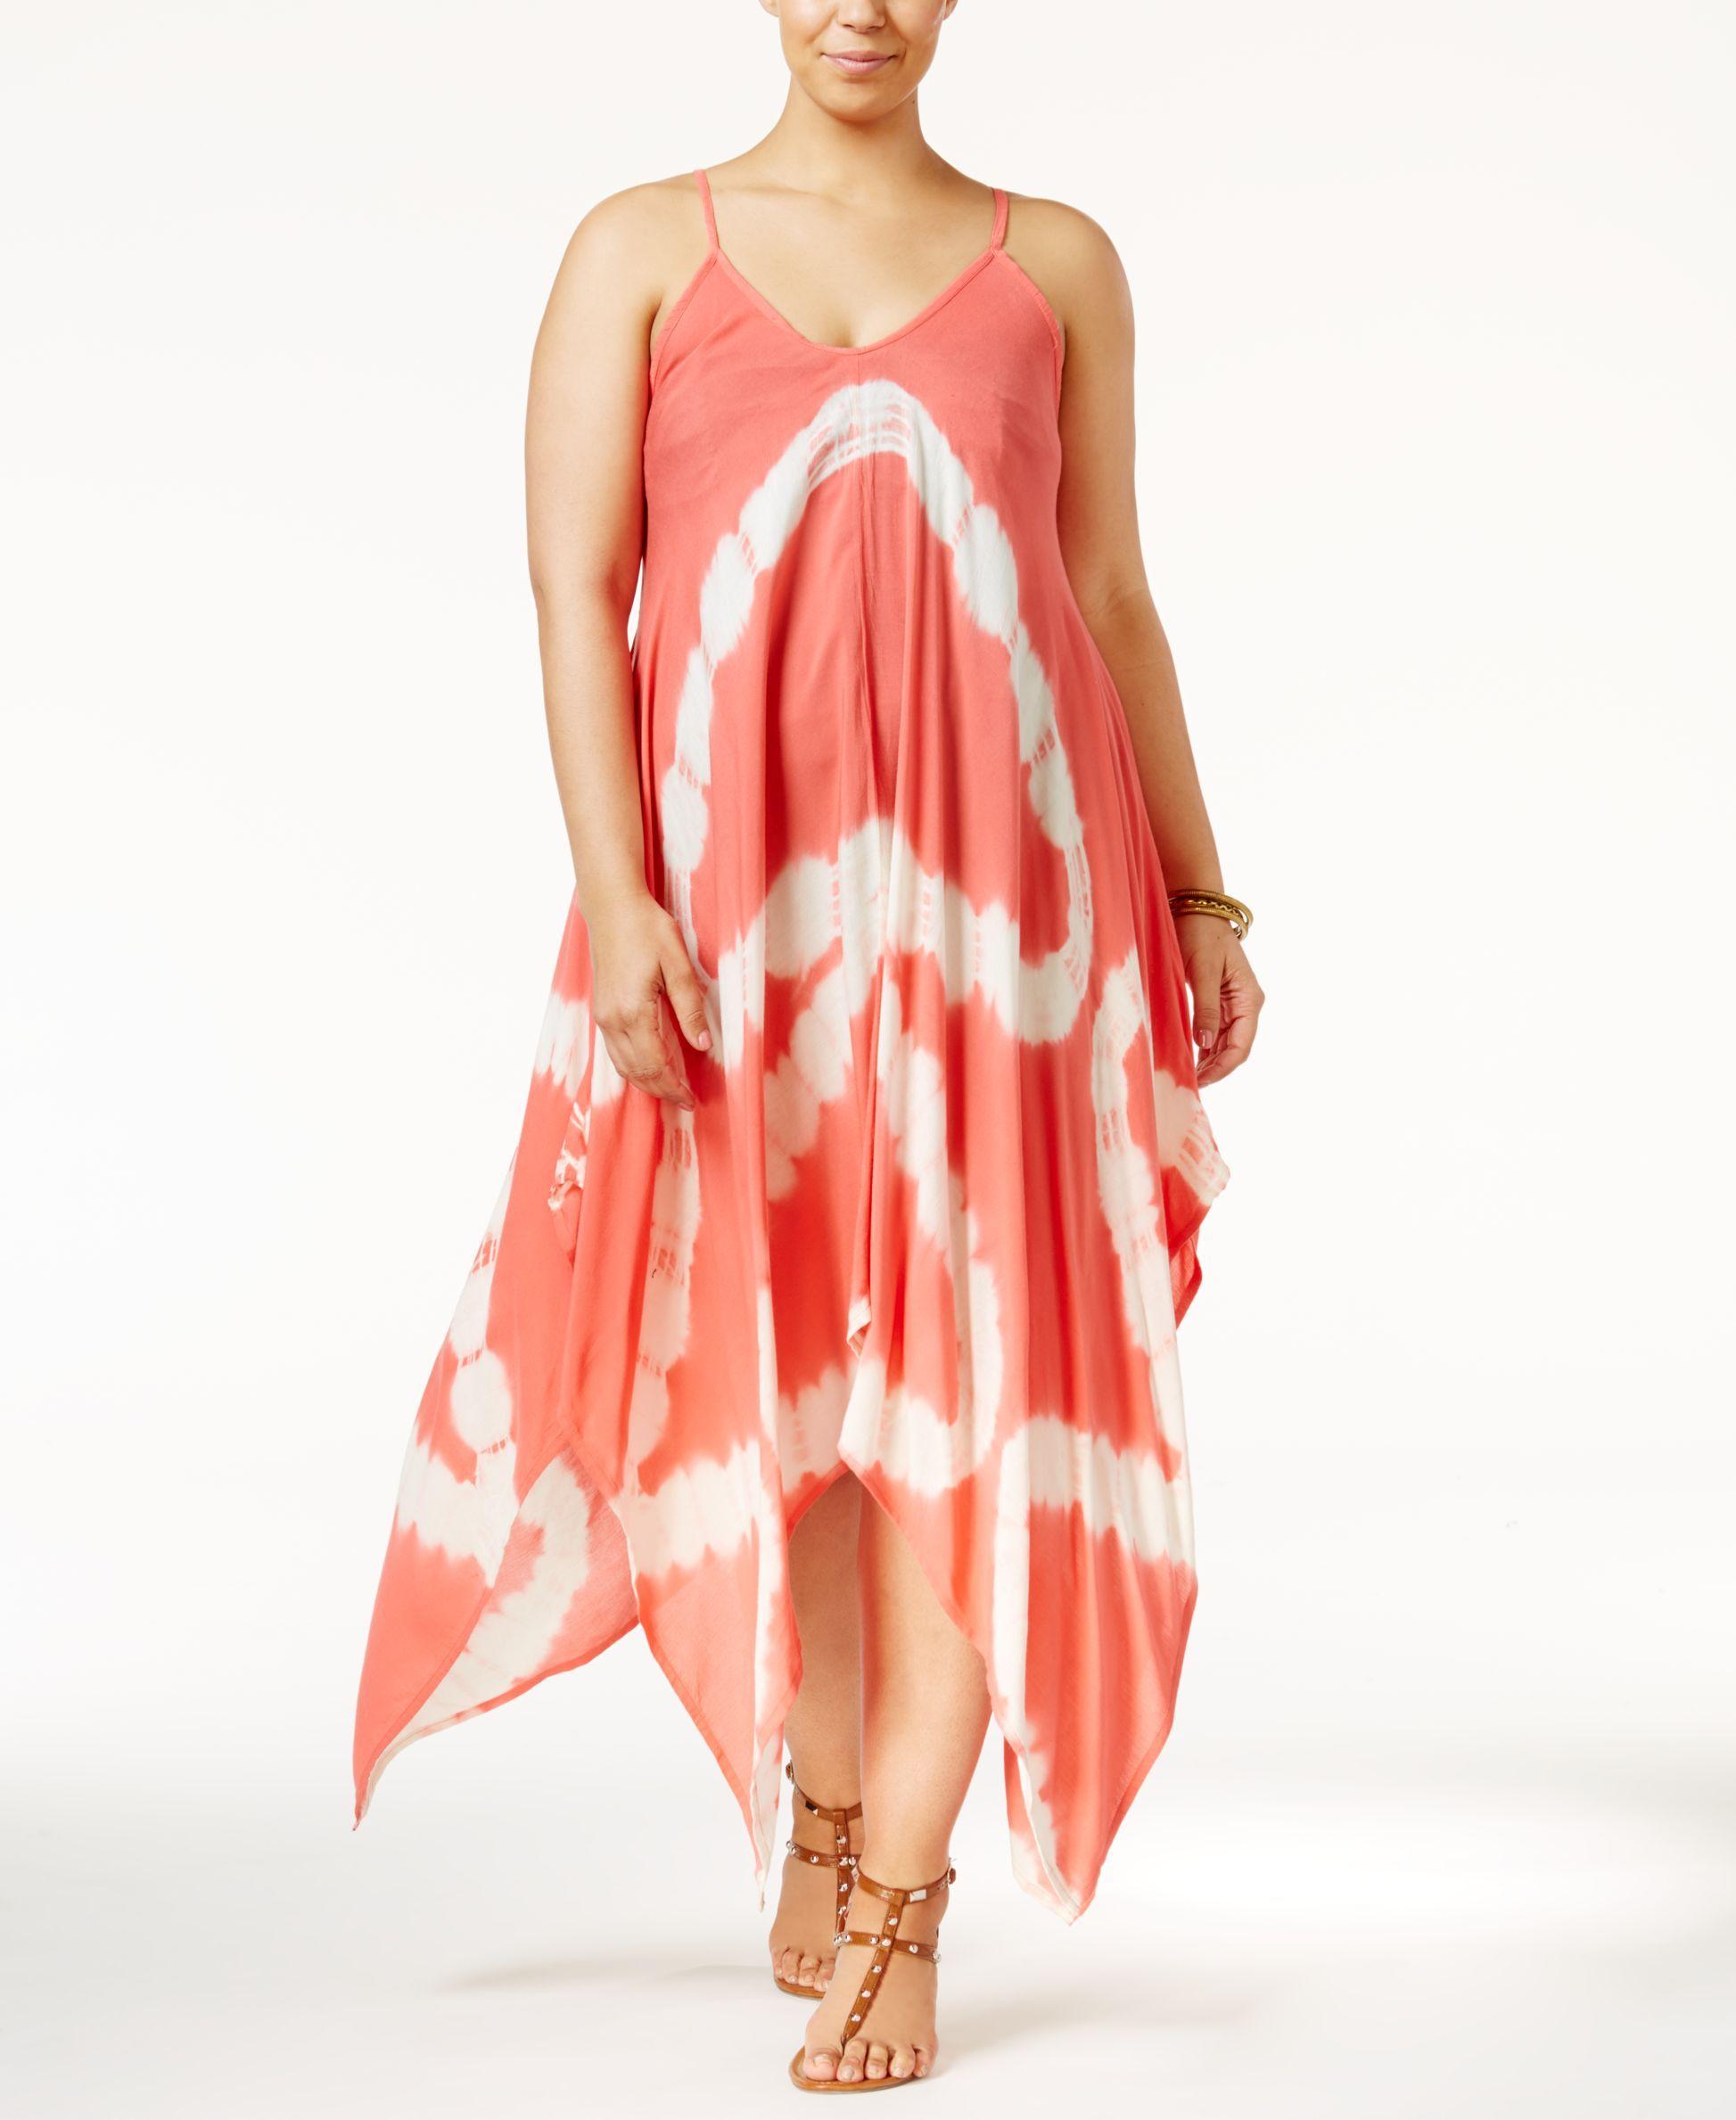 96d324108029c Raviya Plus Size Tie-Dye Handkerchief-Hem Cover-Up Dress | Shades of ...